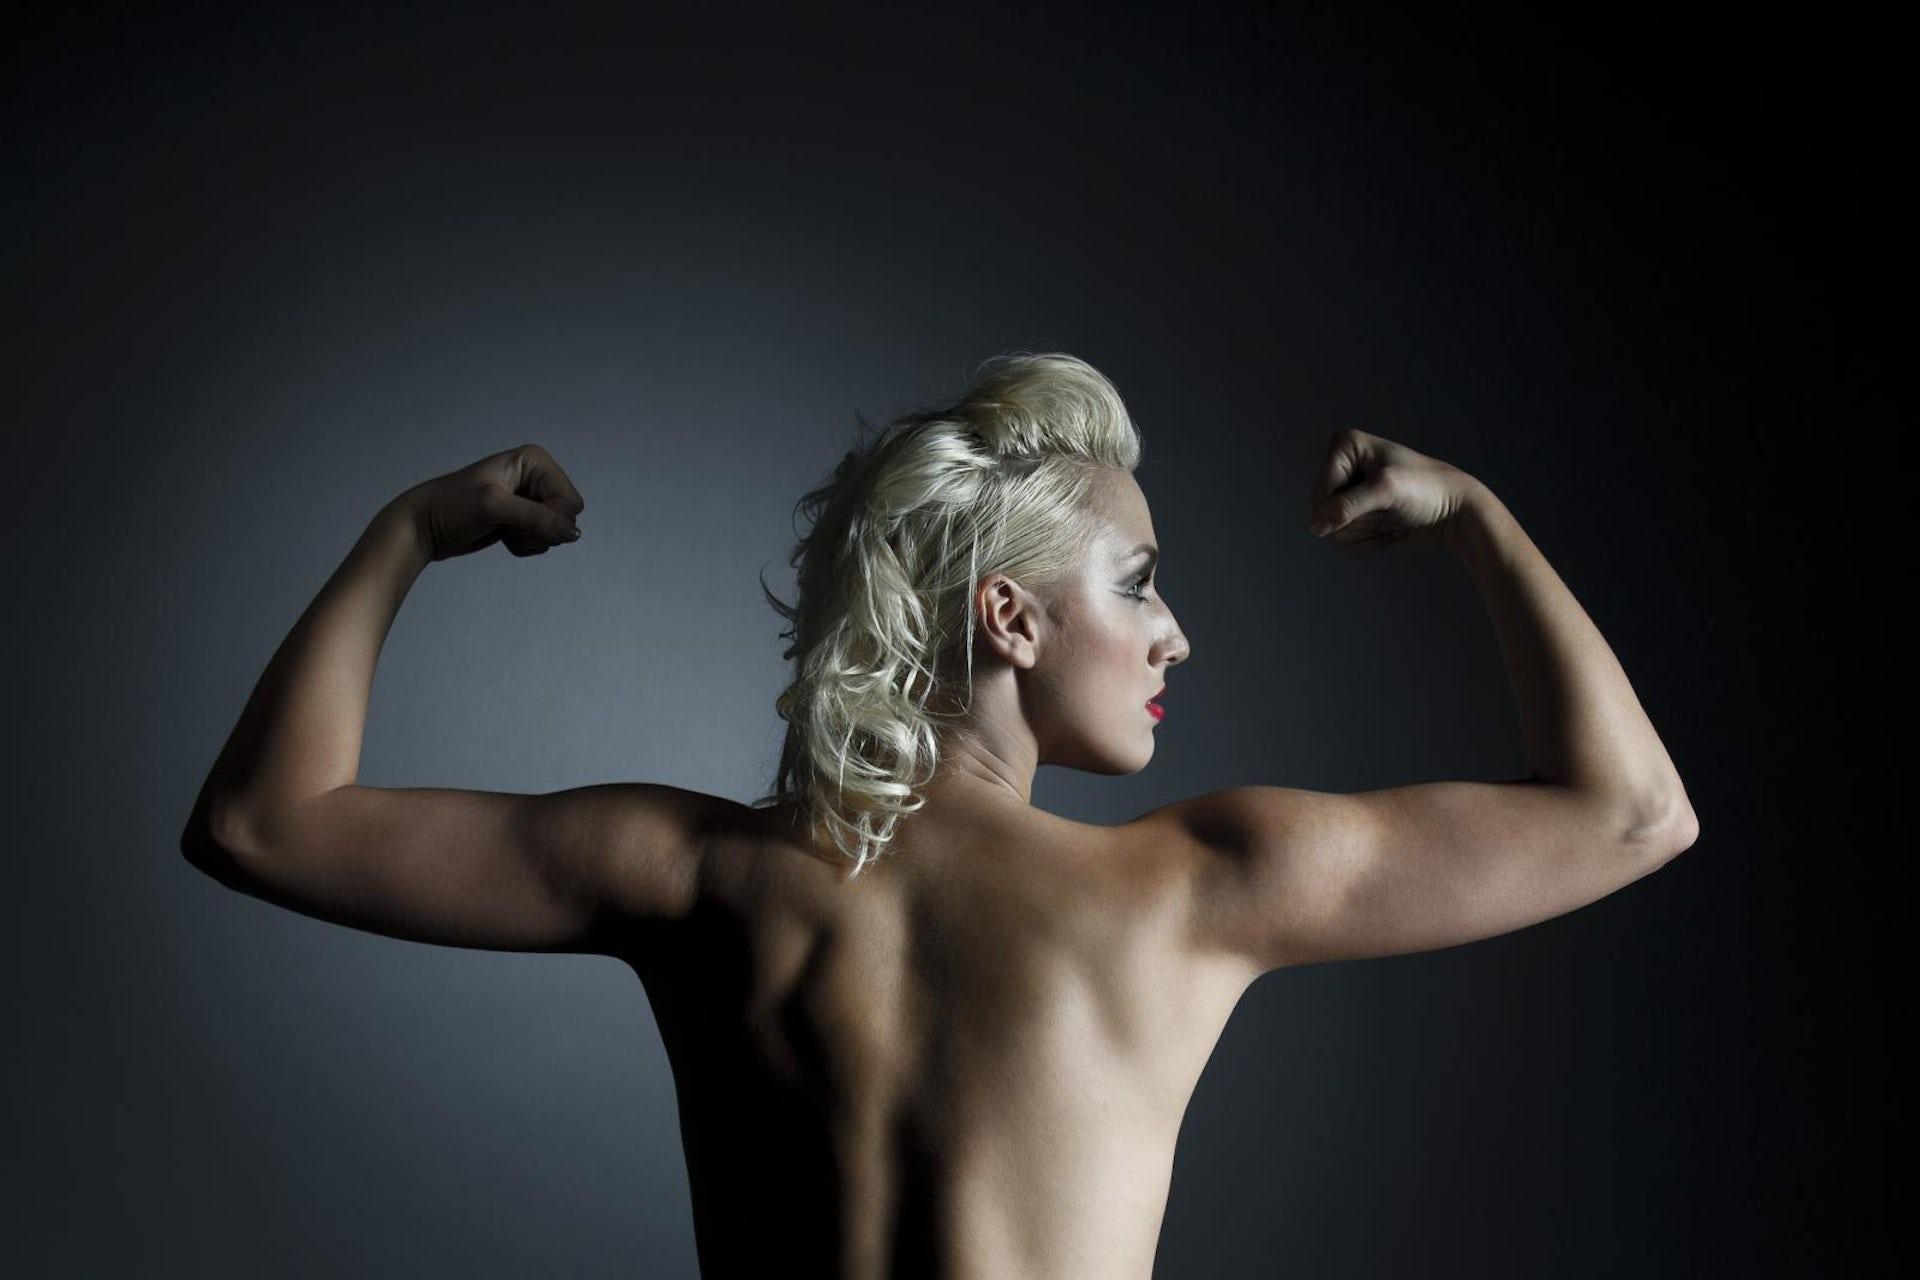 Girl tatto around her butt hole nude